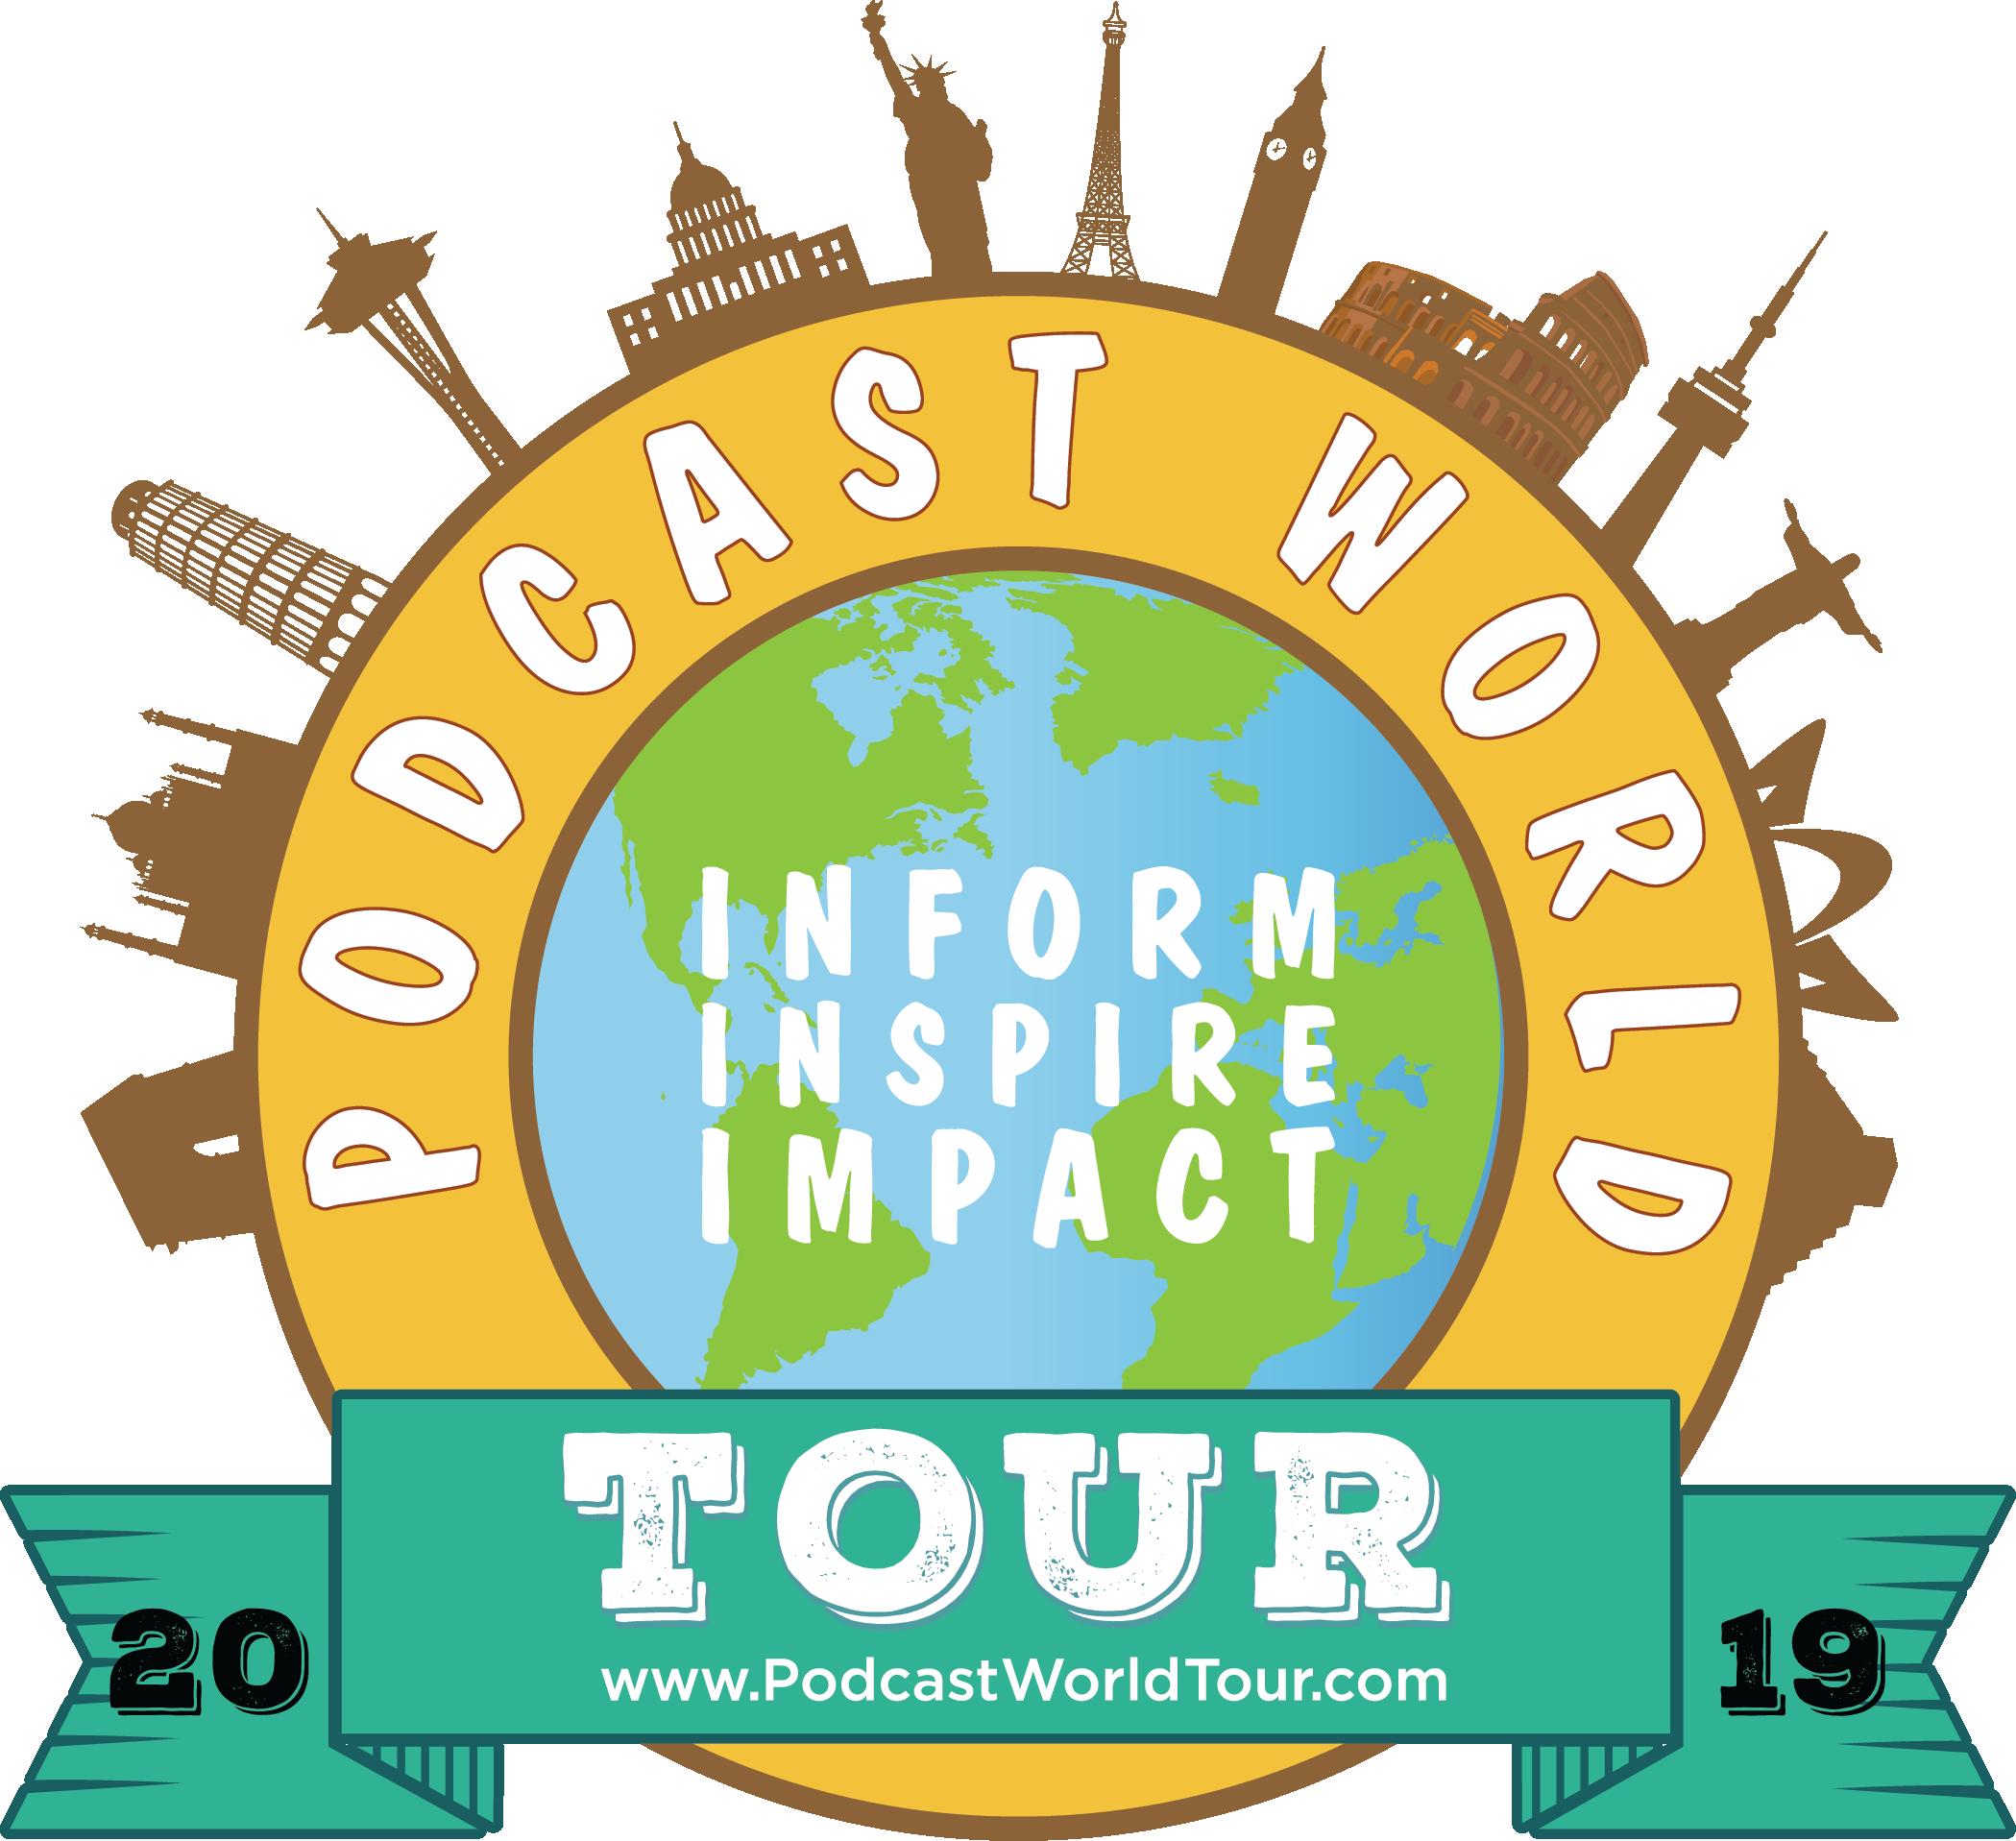 Podcast World Tour